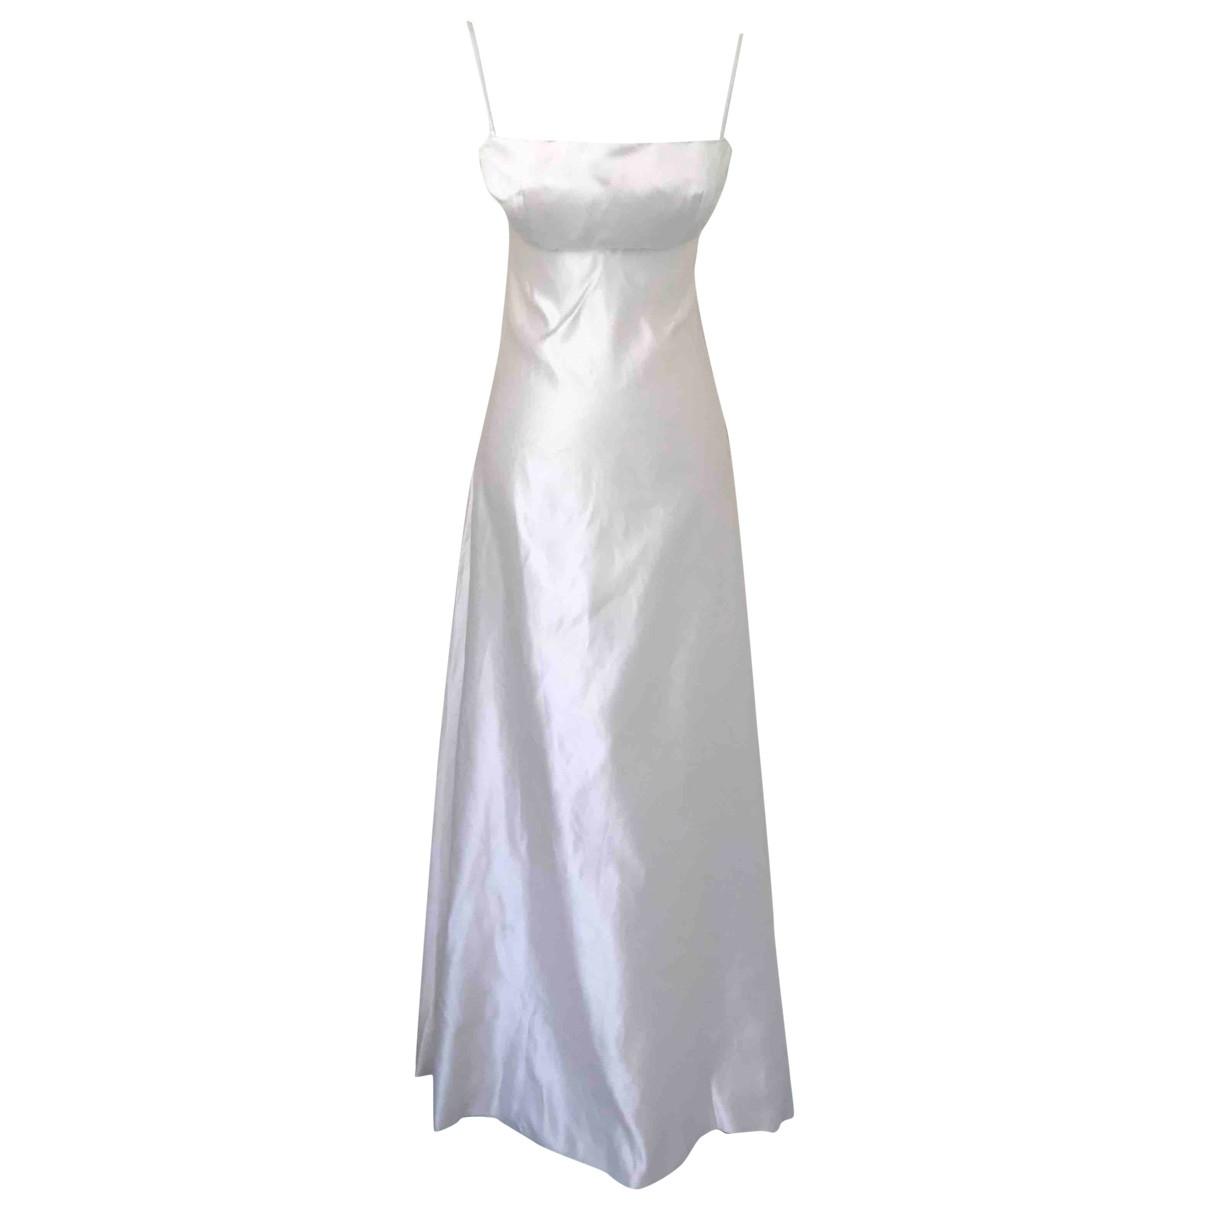 Morgane Le Fay \N White Silk dress for Women S International